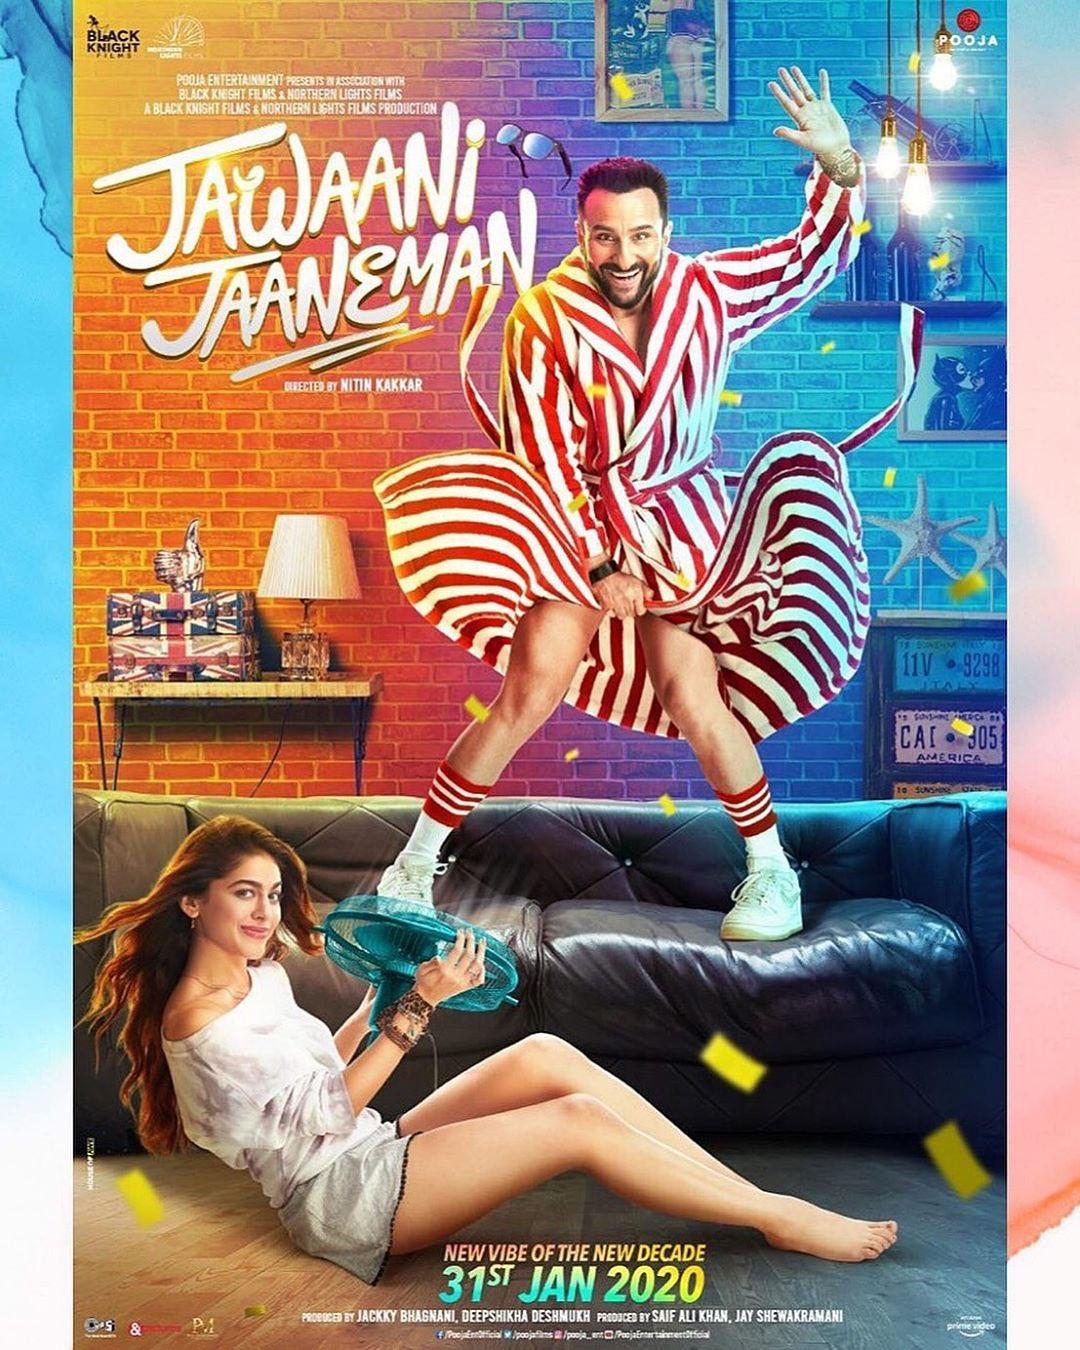 Jawaani-Jaaneman-New-Poster